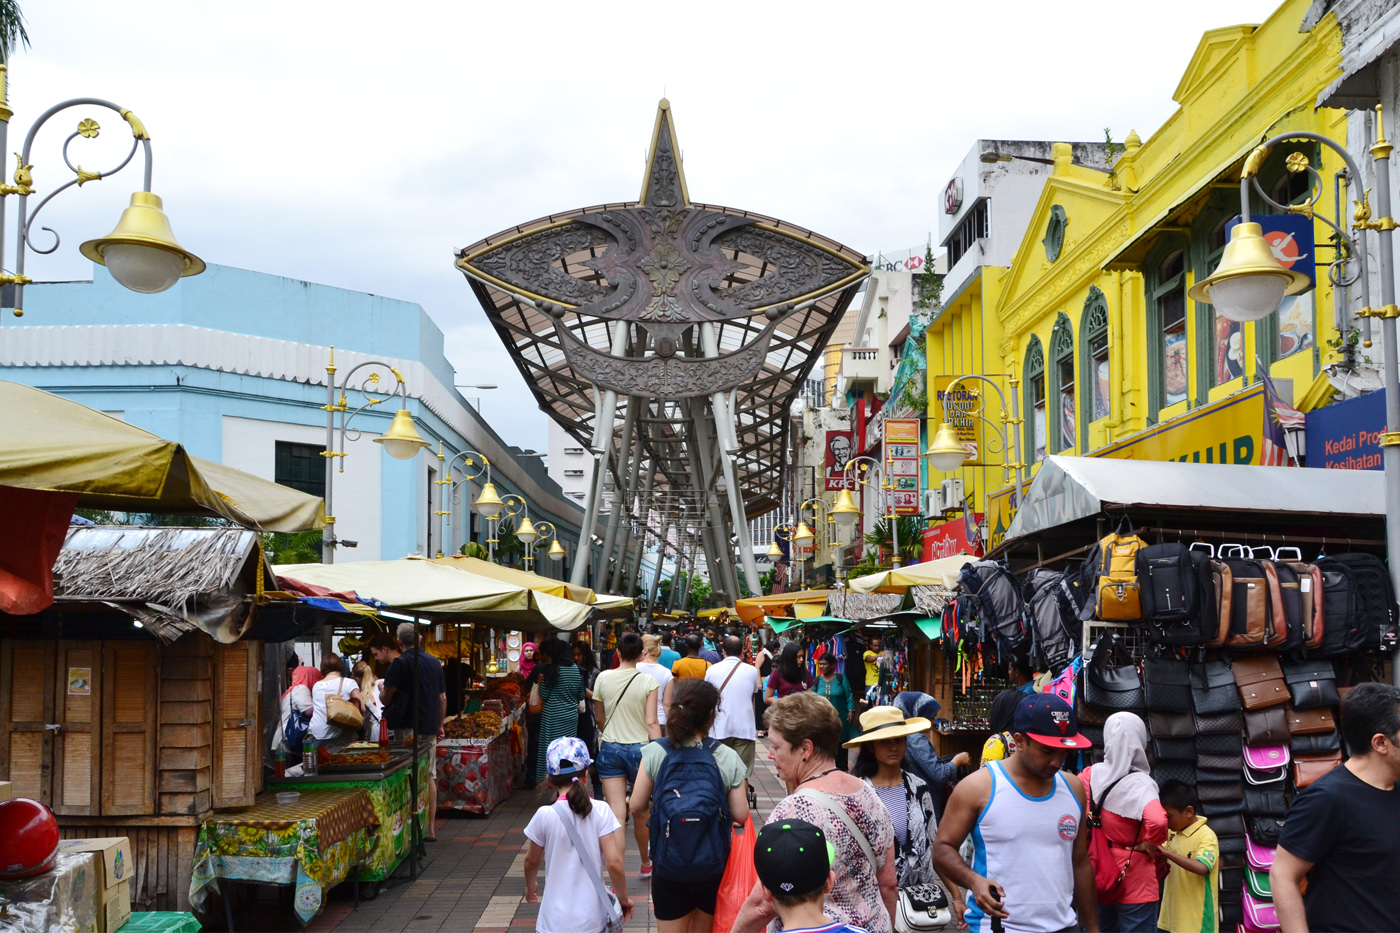 What-to-do-in-Kuala-Lumpur-gucki-market